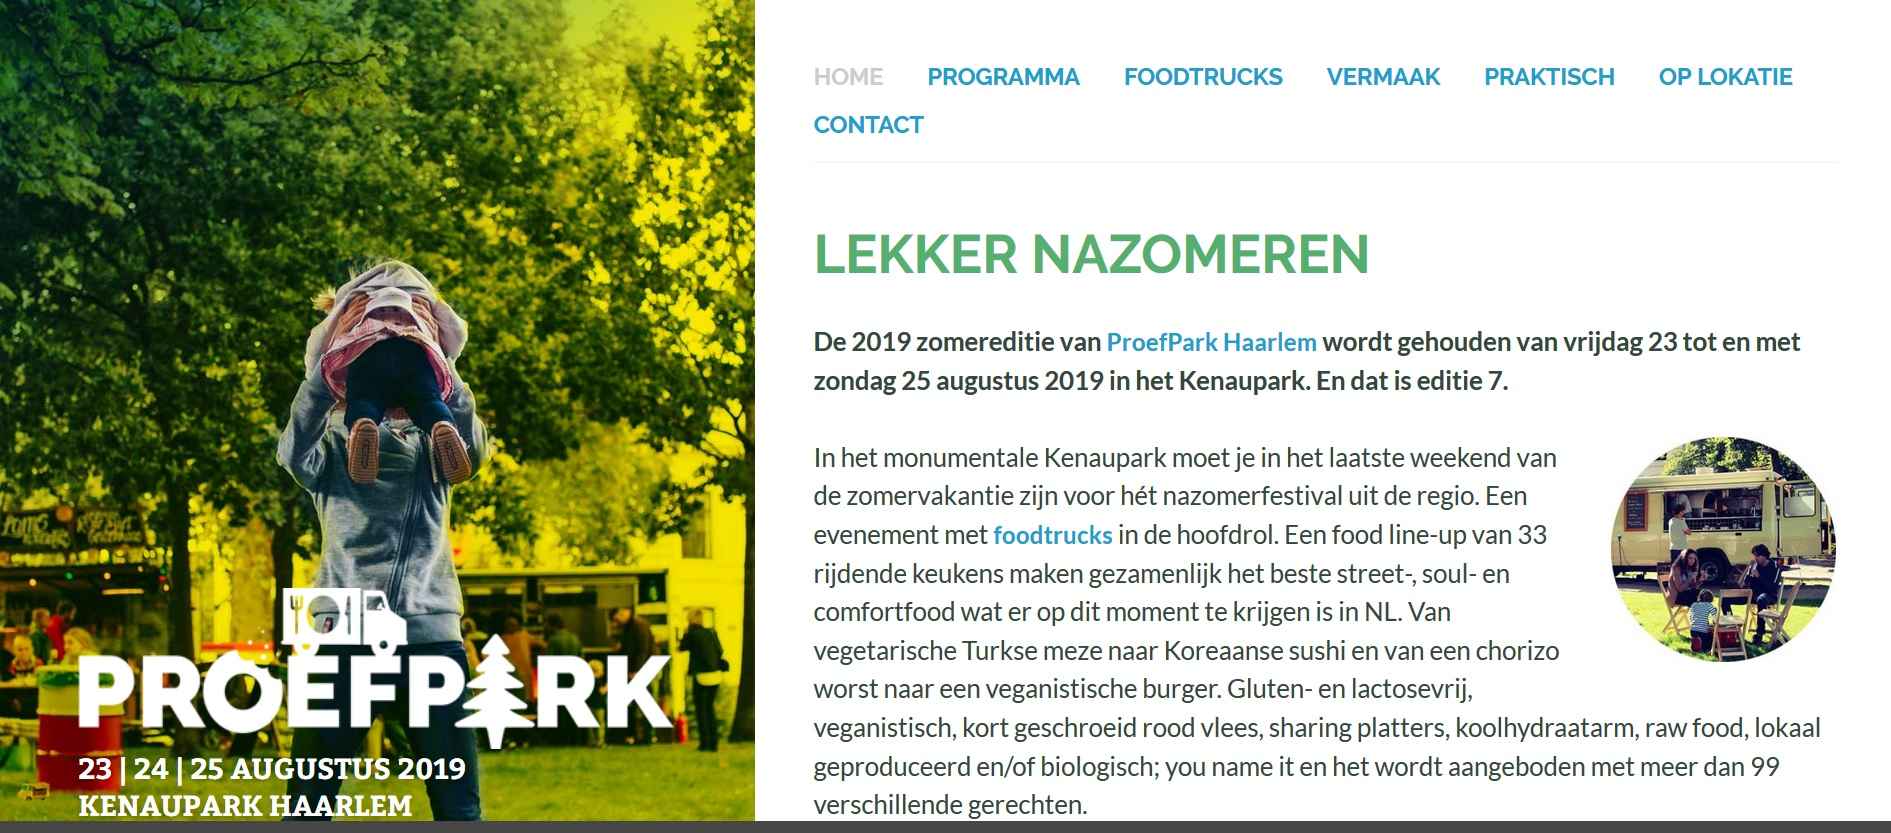 23 t/m 25 augustus 2019 Proefpark Haarlem